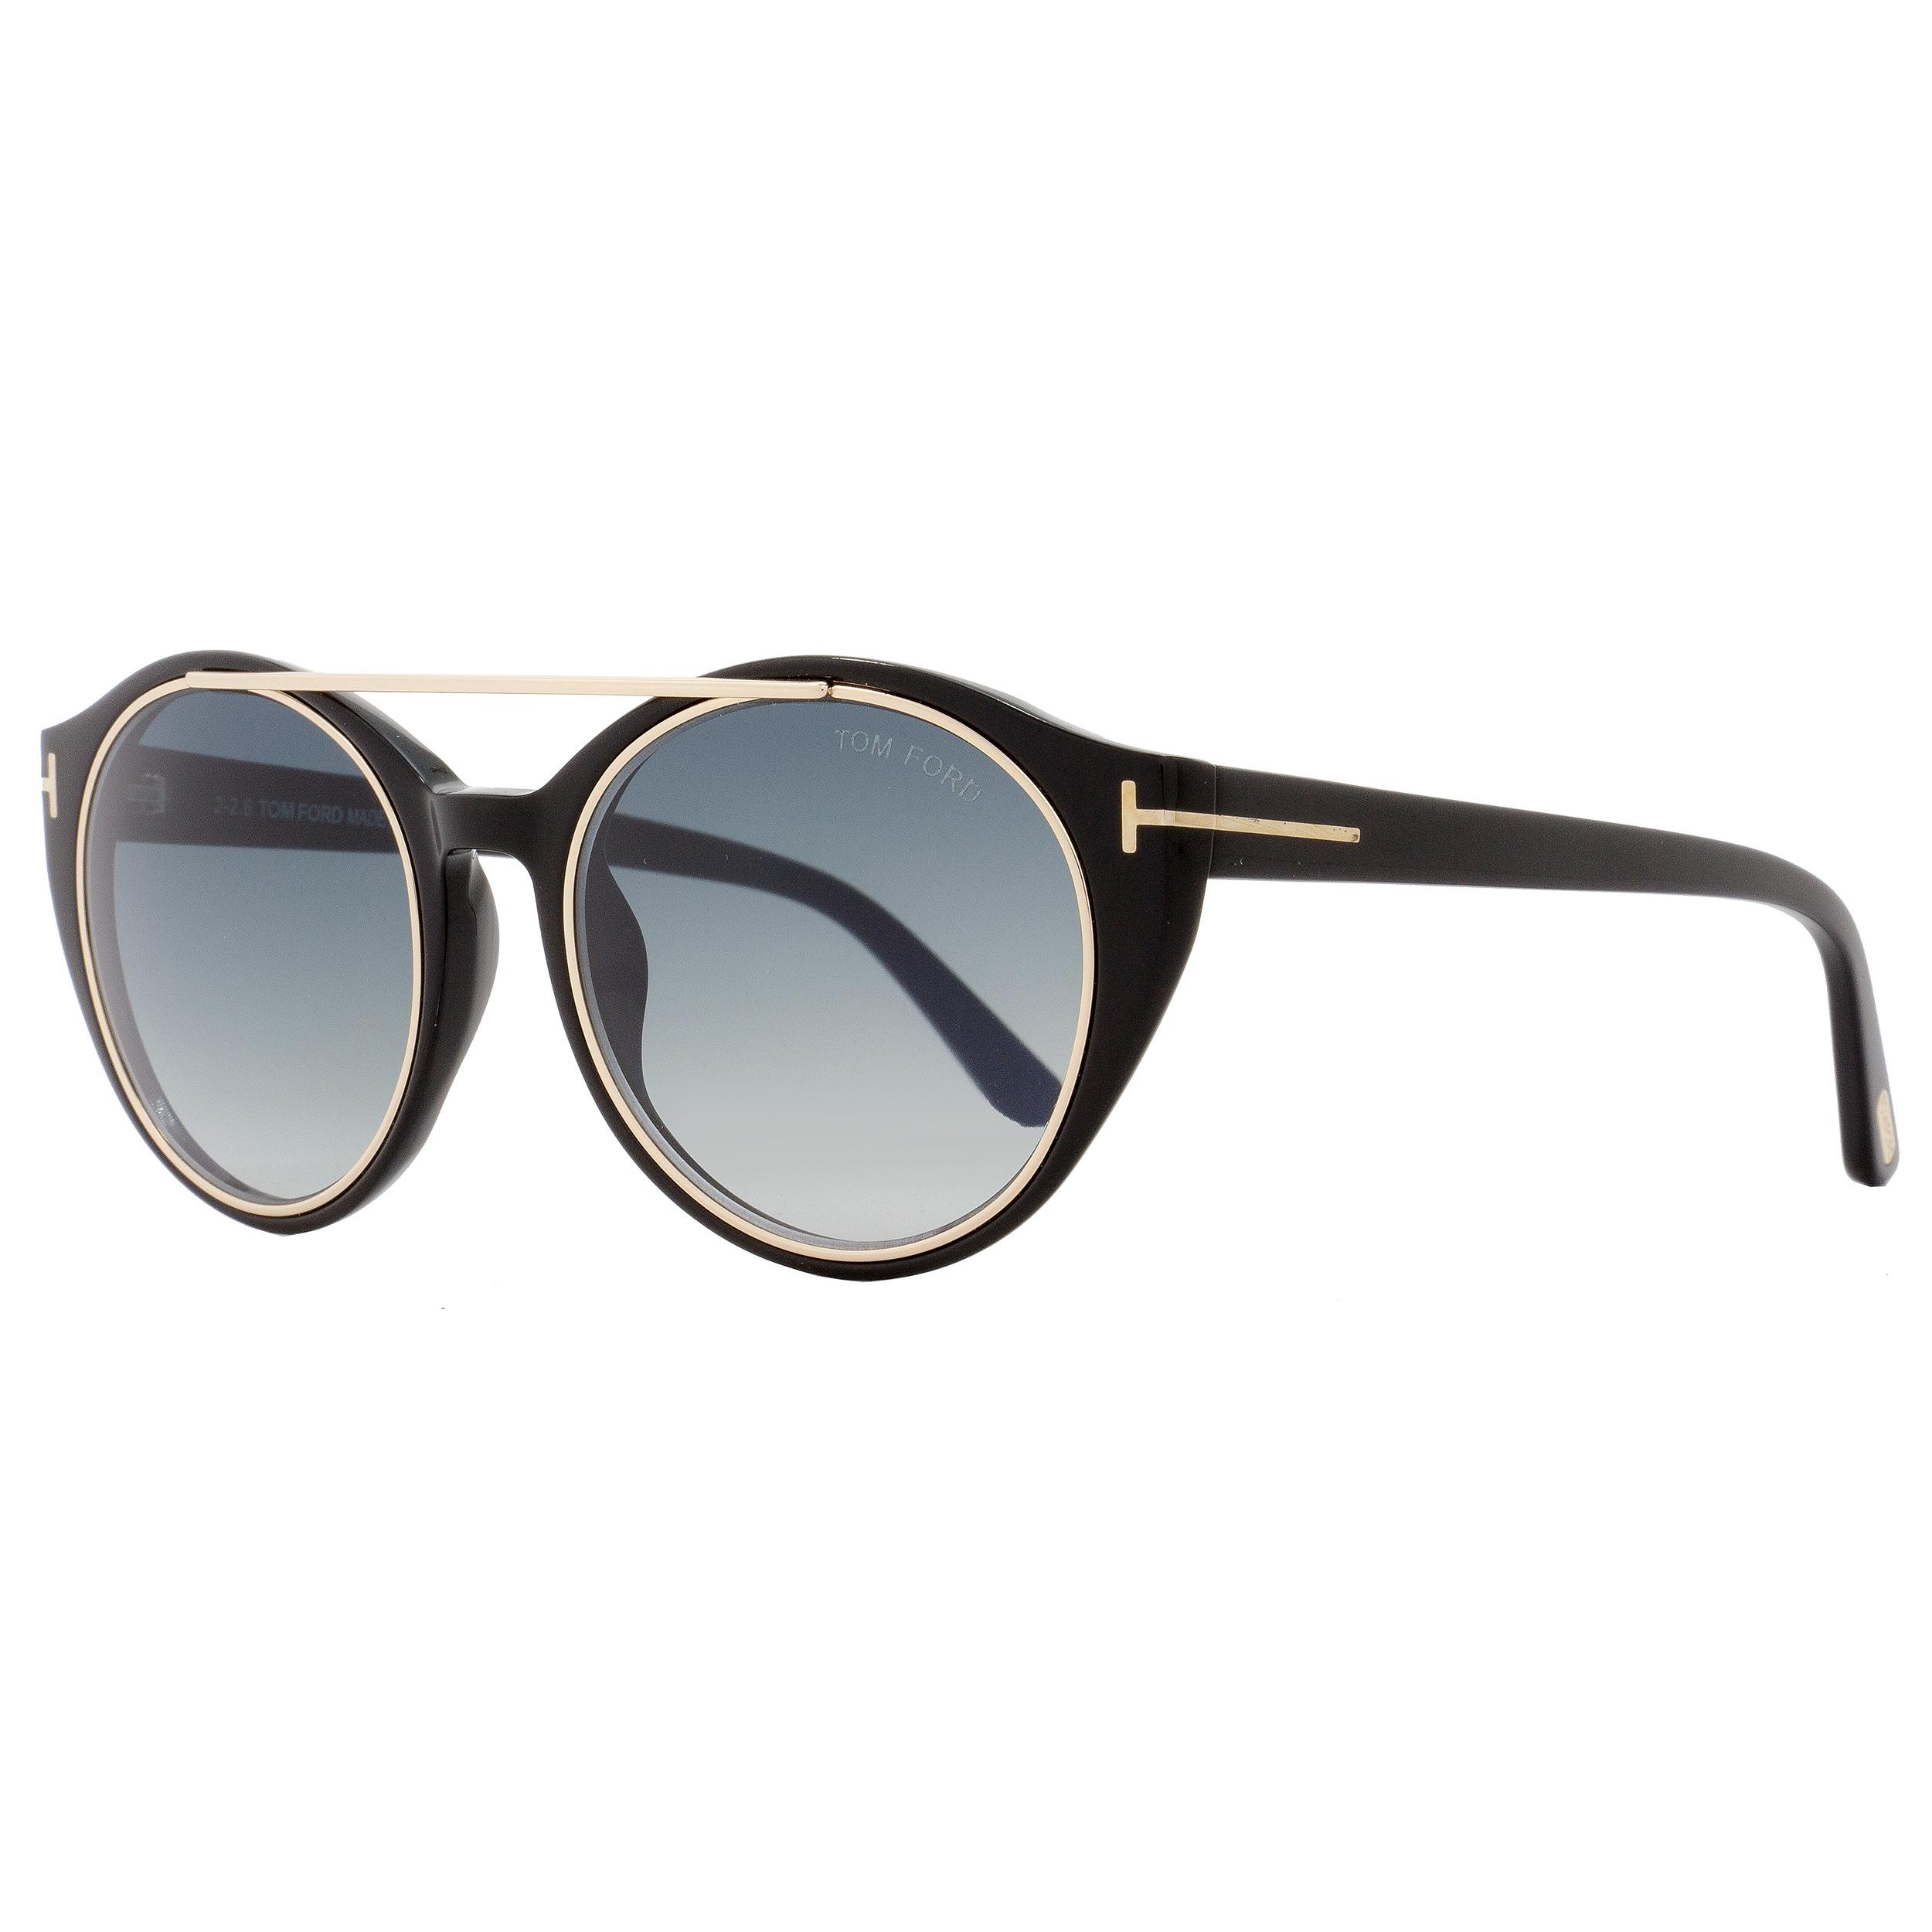 sunglasses women p popular s tom womens glasses ford top